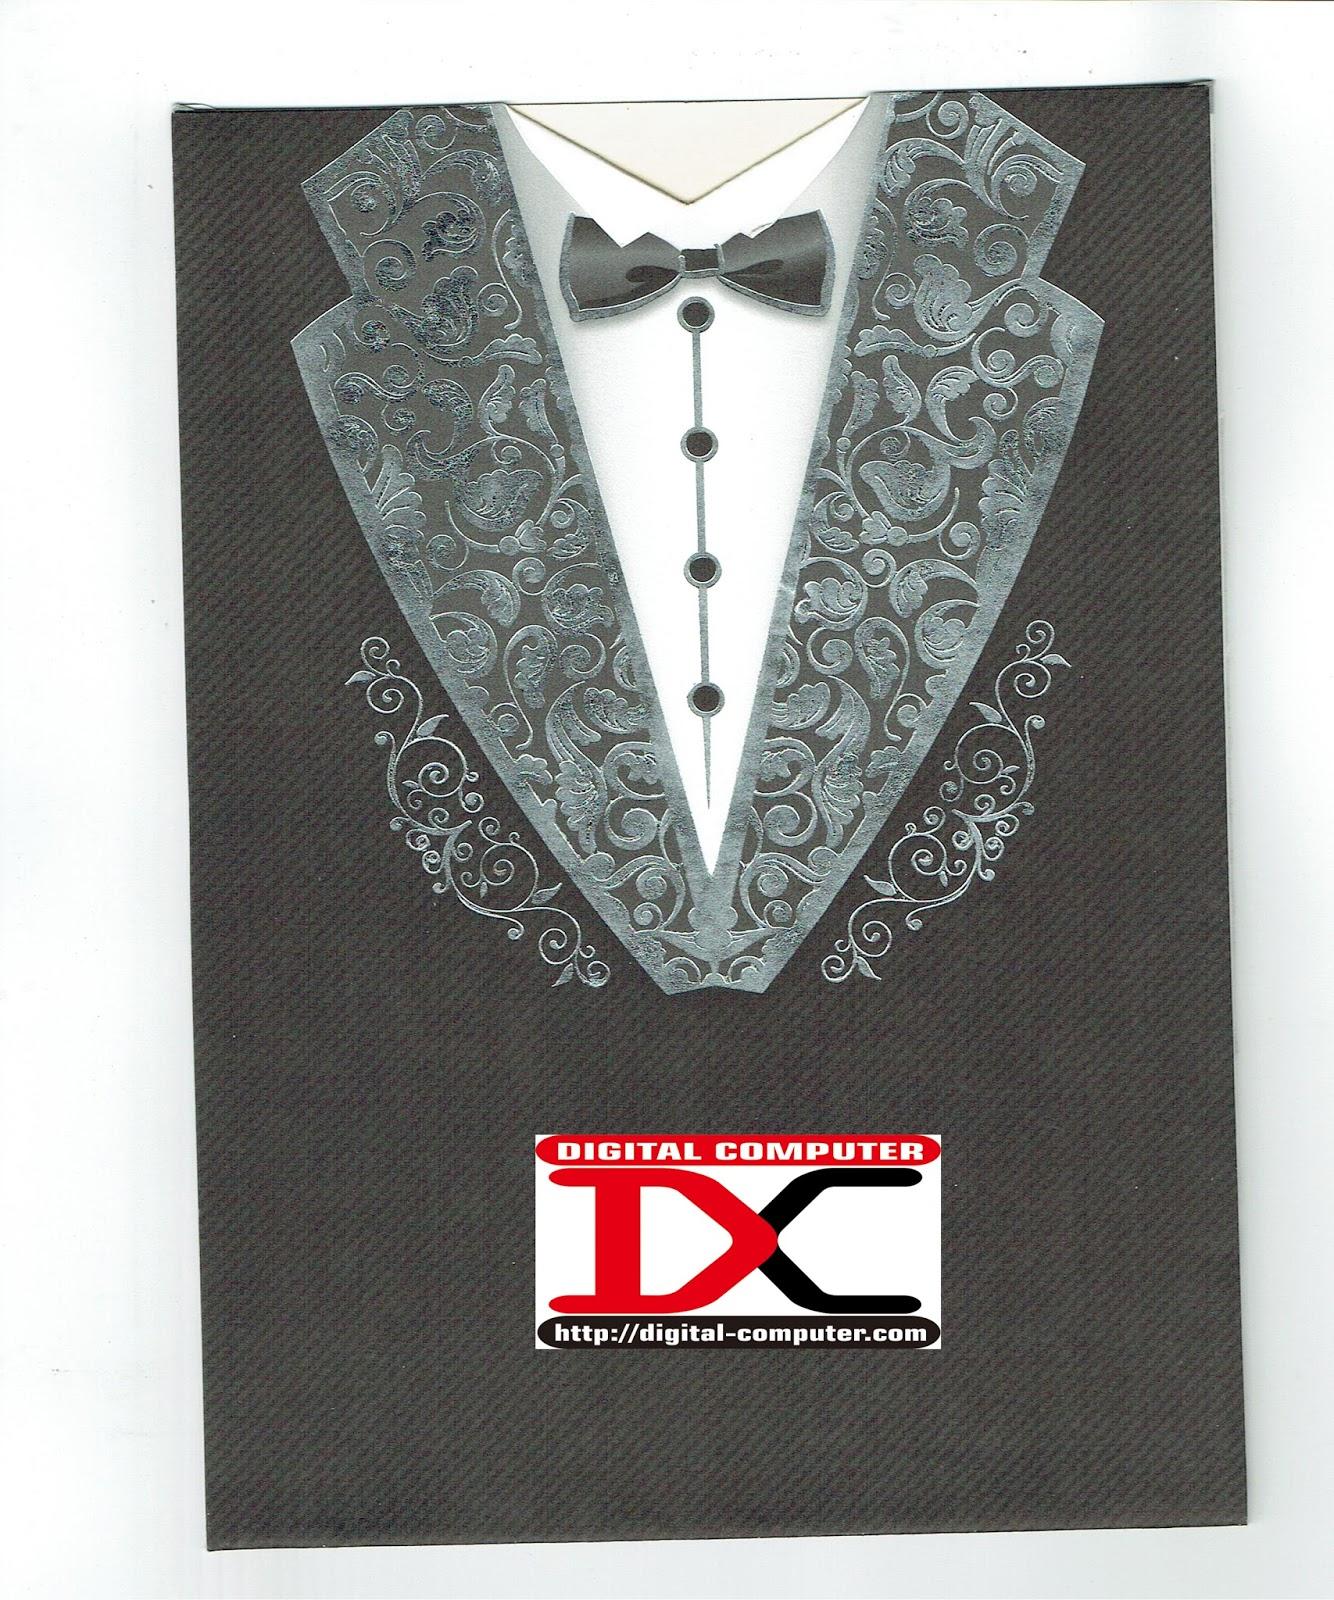 undangan pernikahan harga 3500